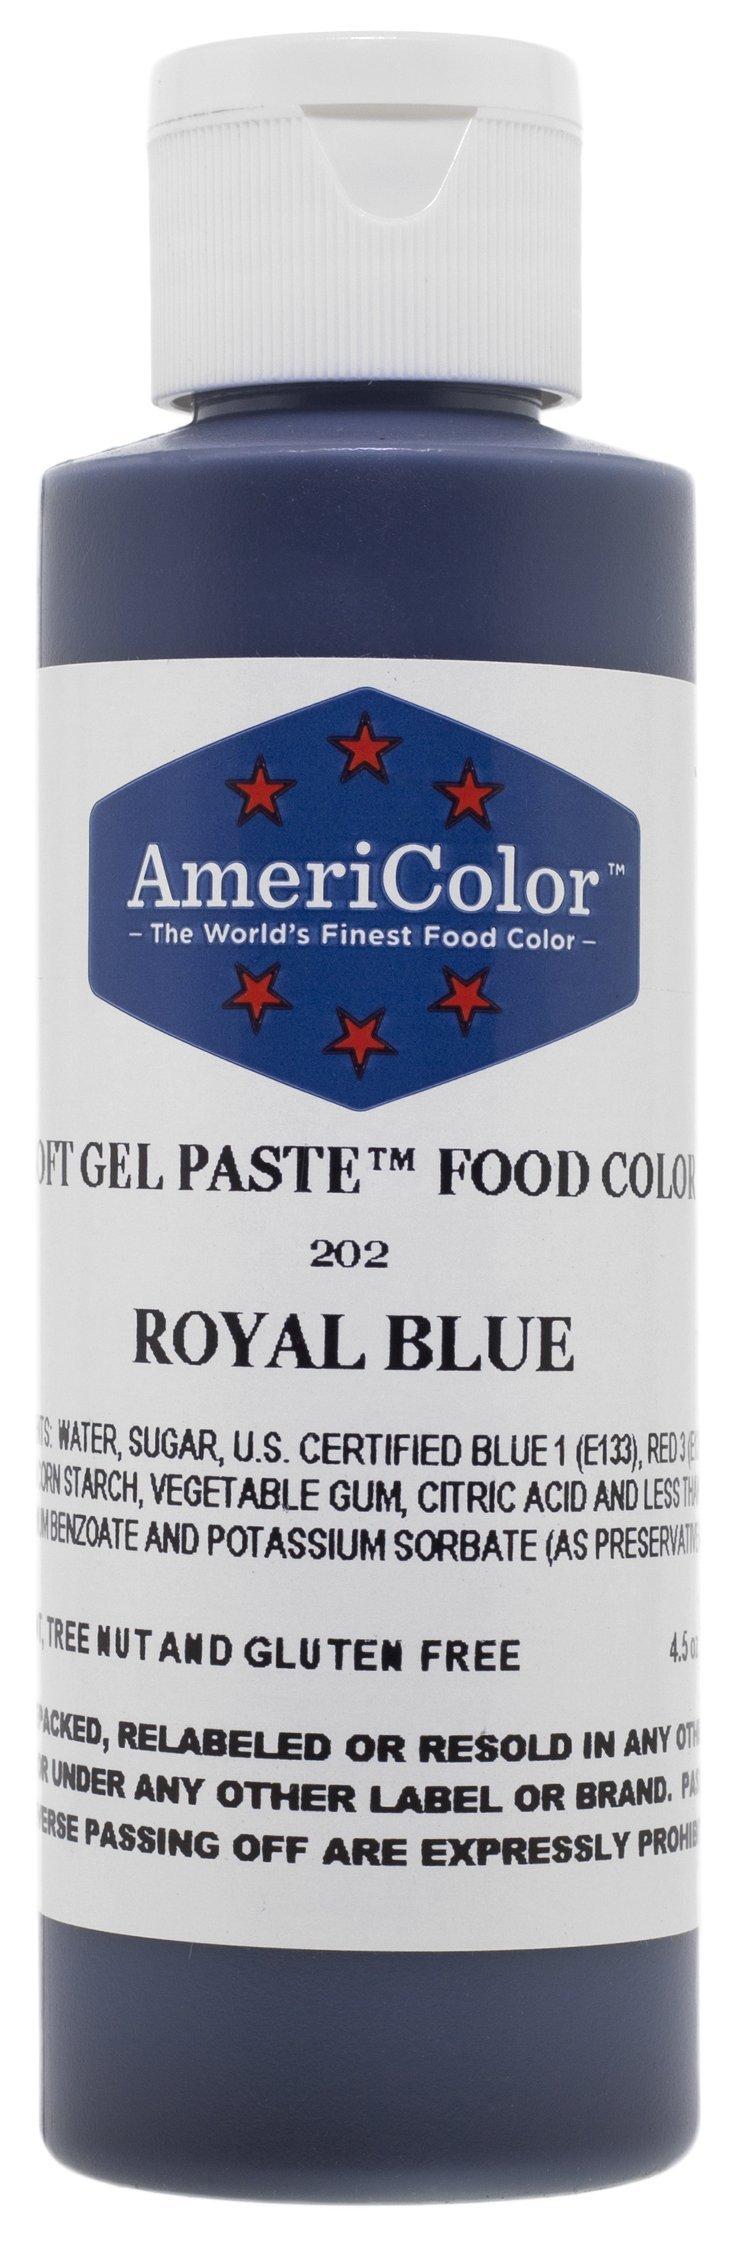 Buy AmeriColor Soft Gel Paste ROYAL BLUE 4.5oz Cake ...